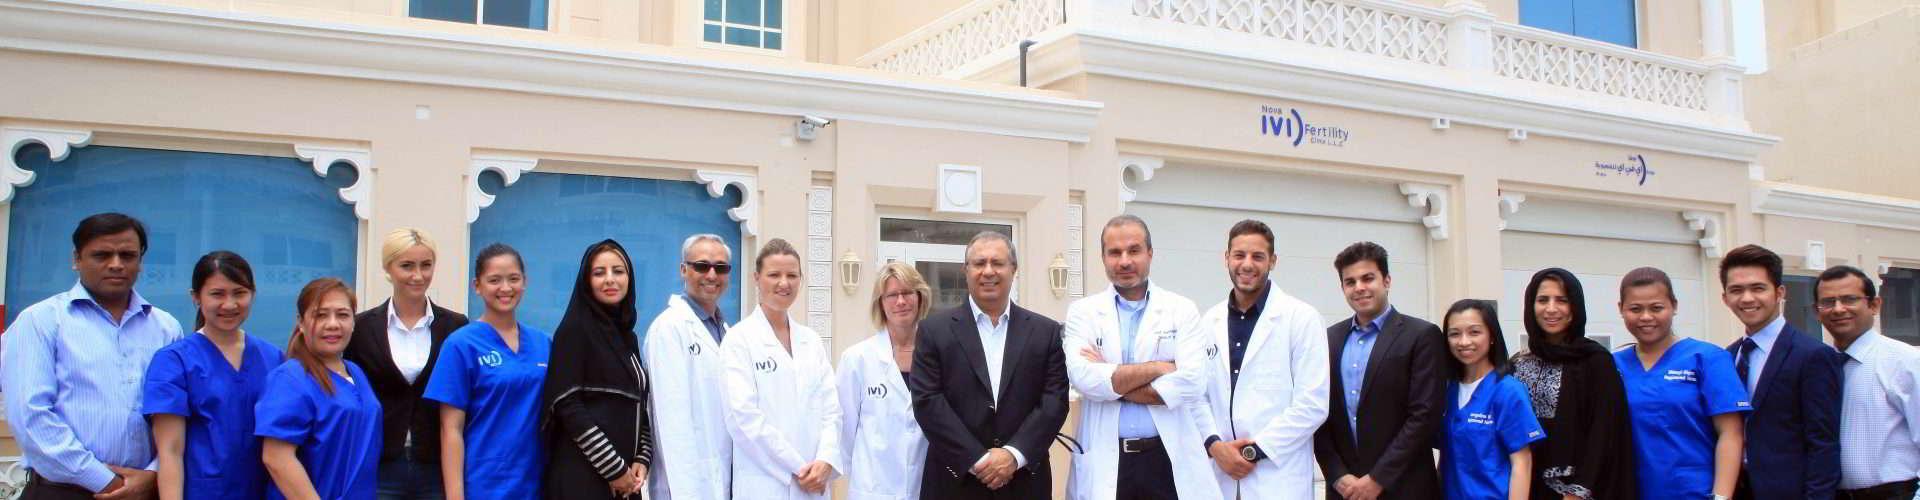 IVI Abu Dhabi, a primeira clínica IVI no Médio Oriente